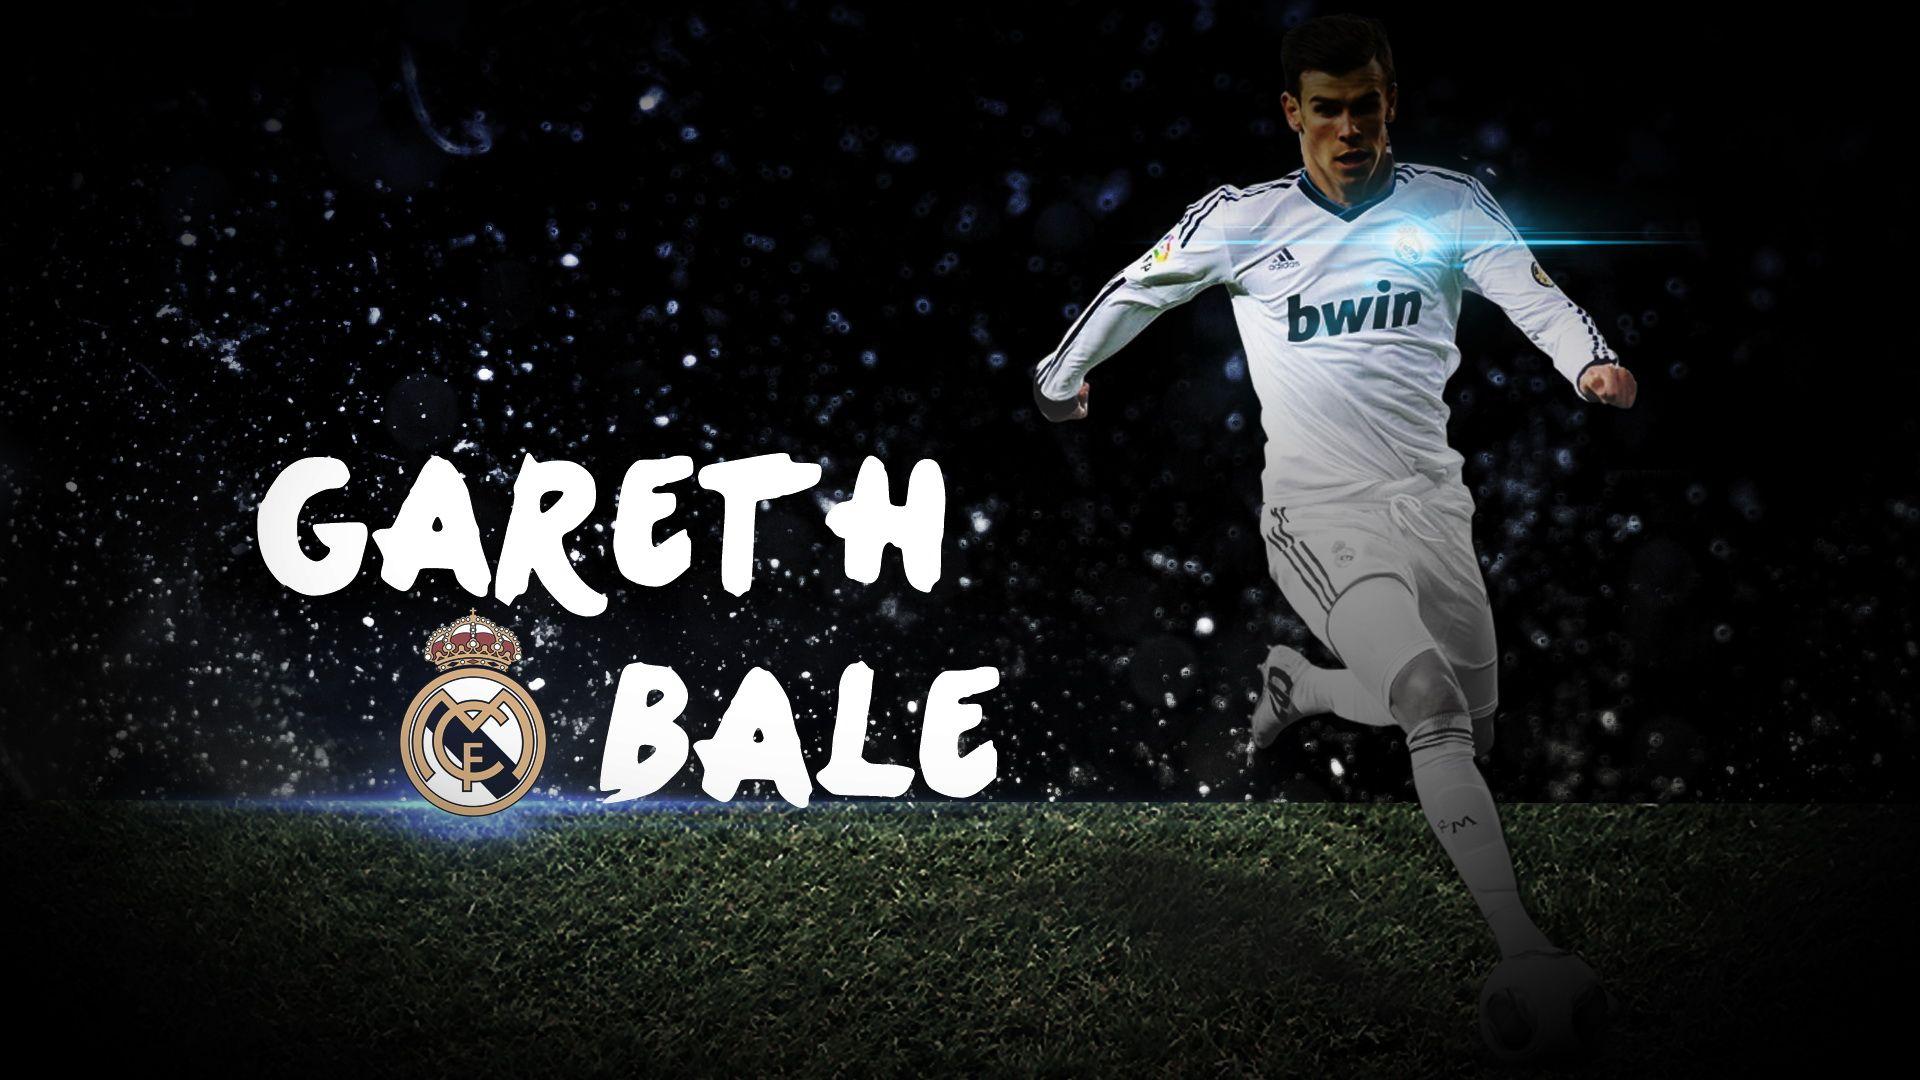 Gareth Bale Football Wallpaper Gareth Bale Football Wallpaper Baling